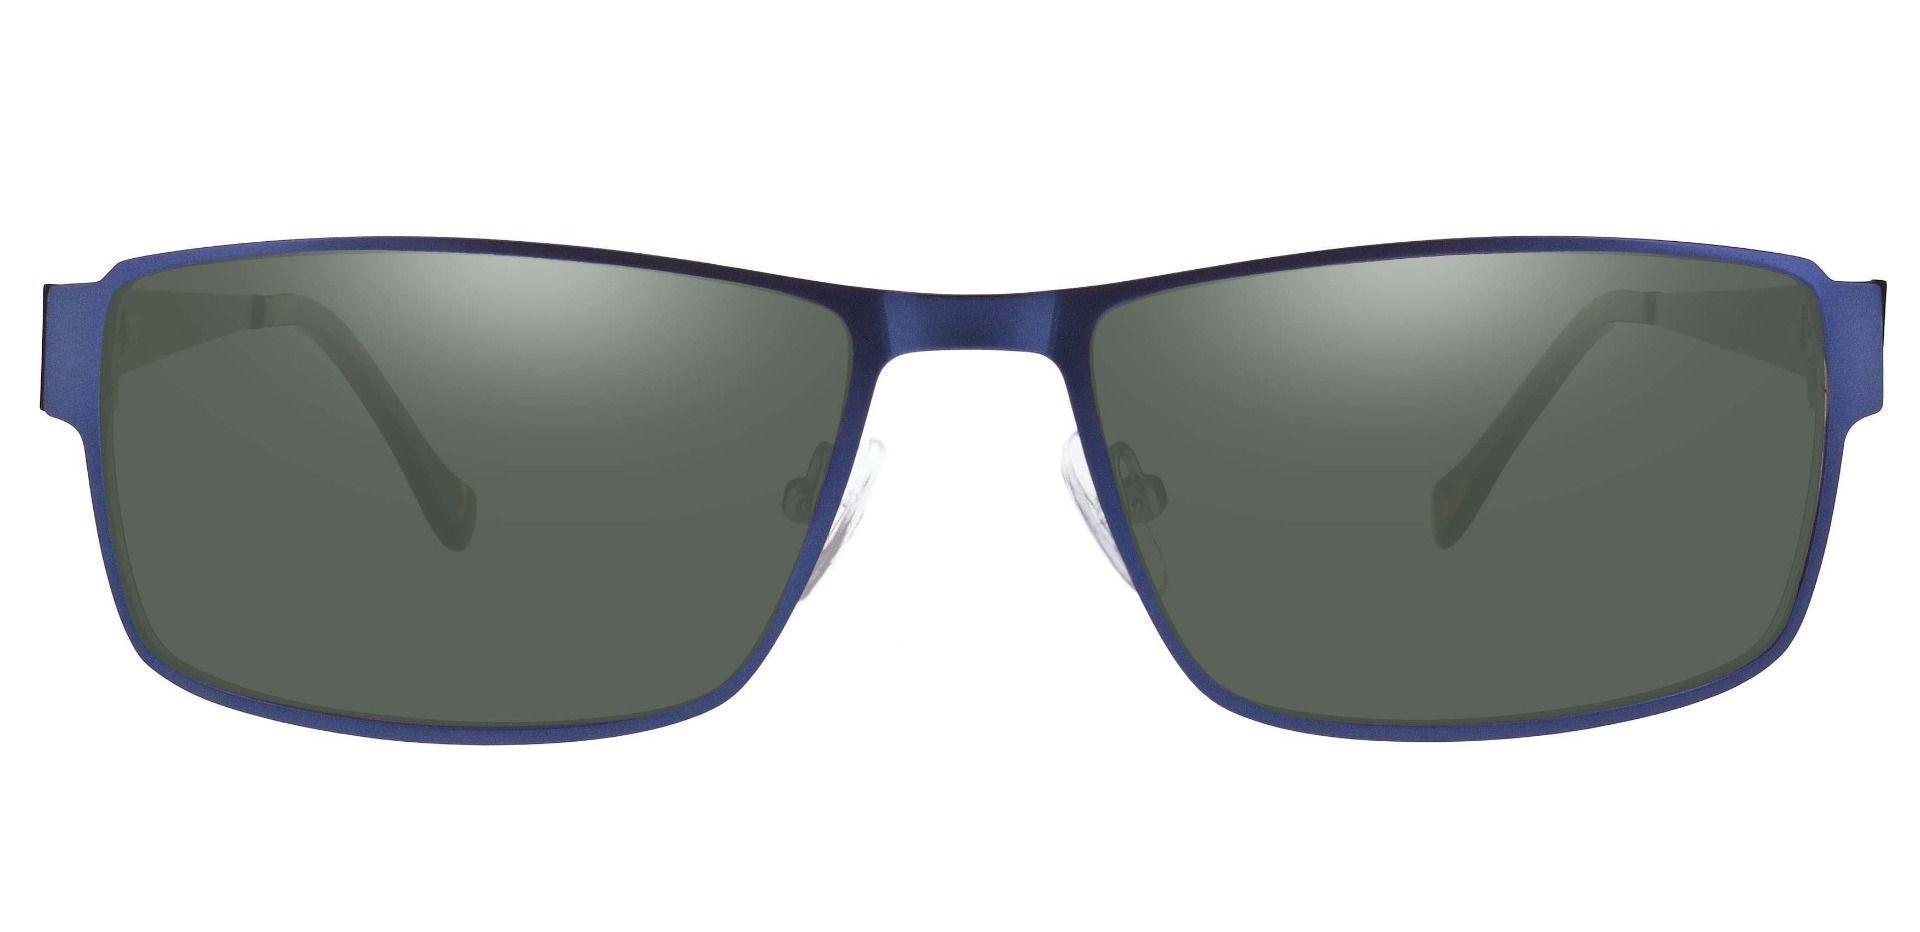 Franco Rectangle Prescription Sunglasses - Blue Frame With Green Lenses